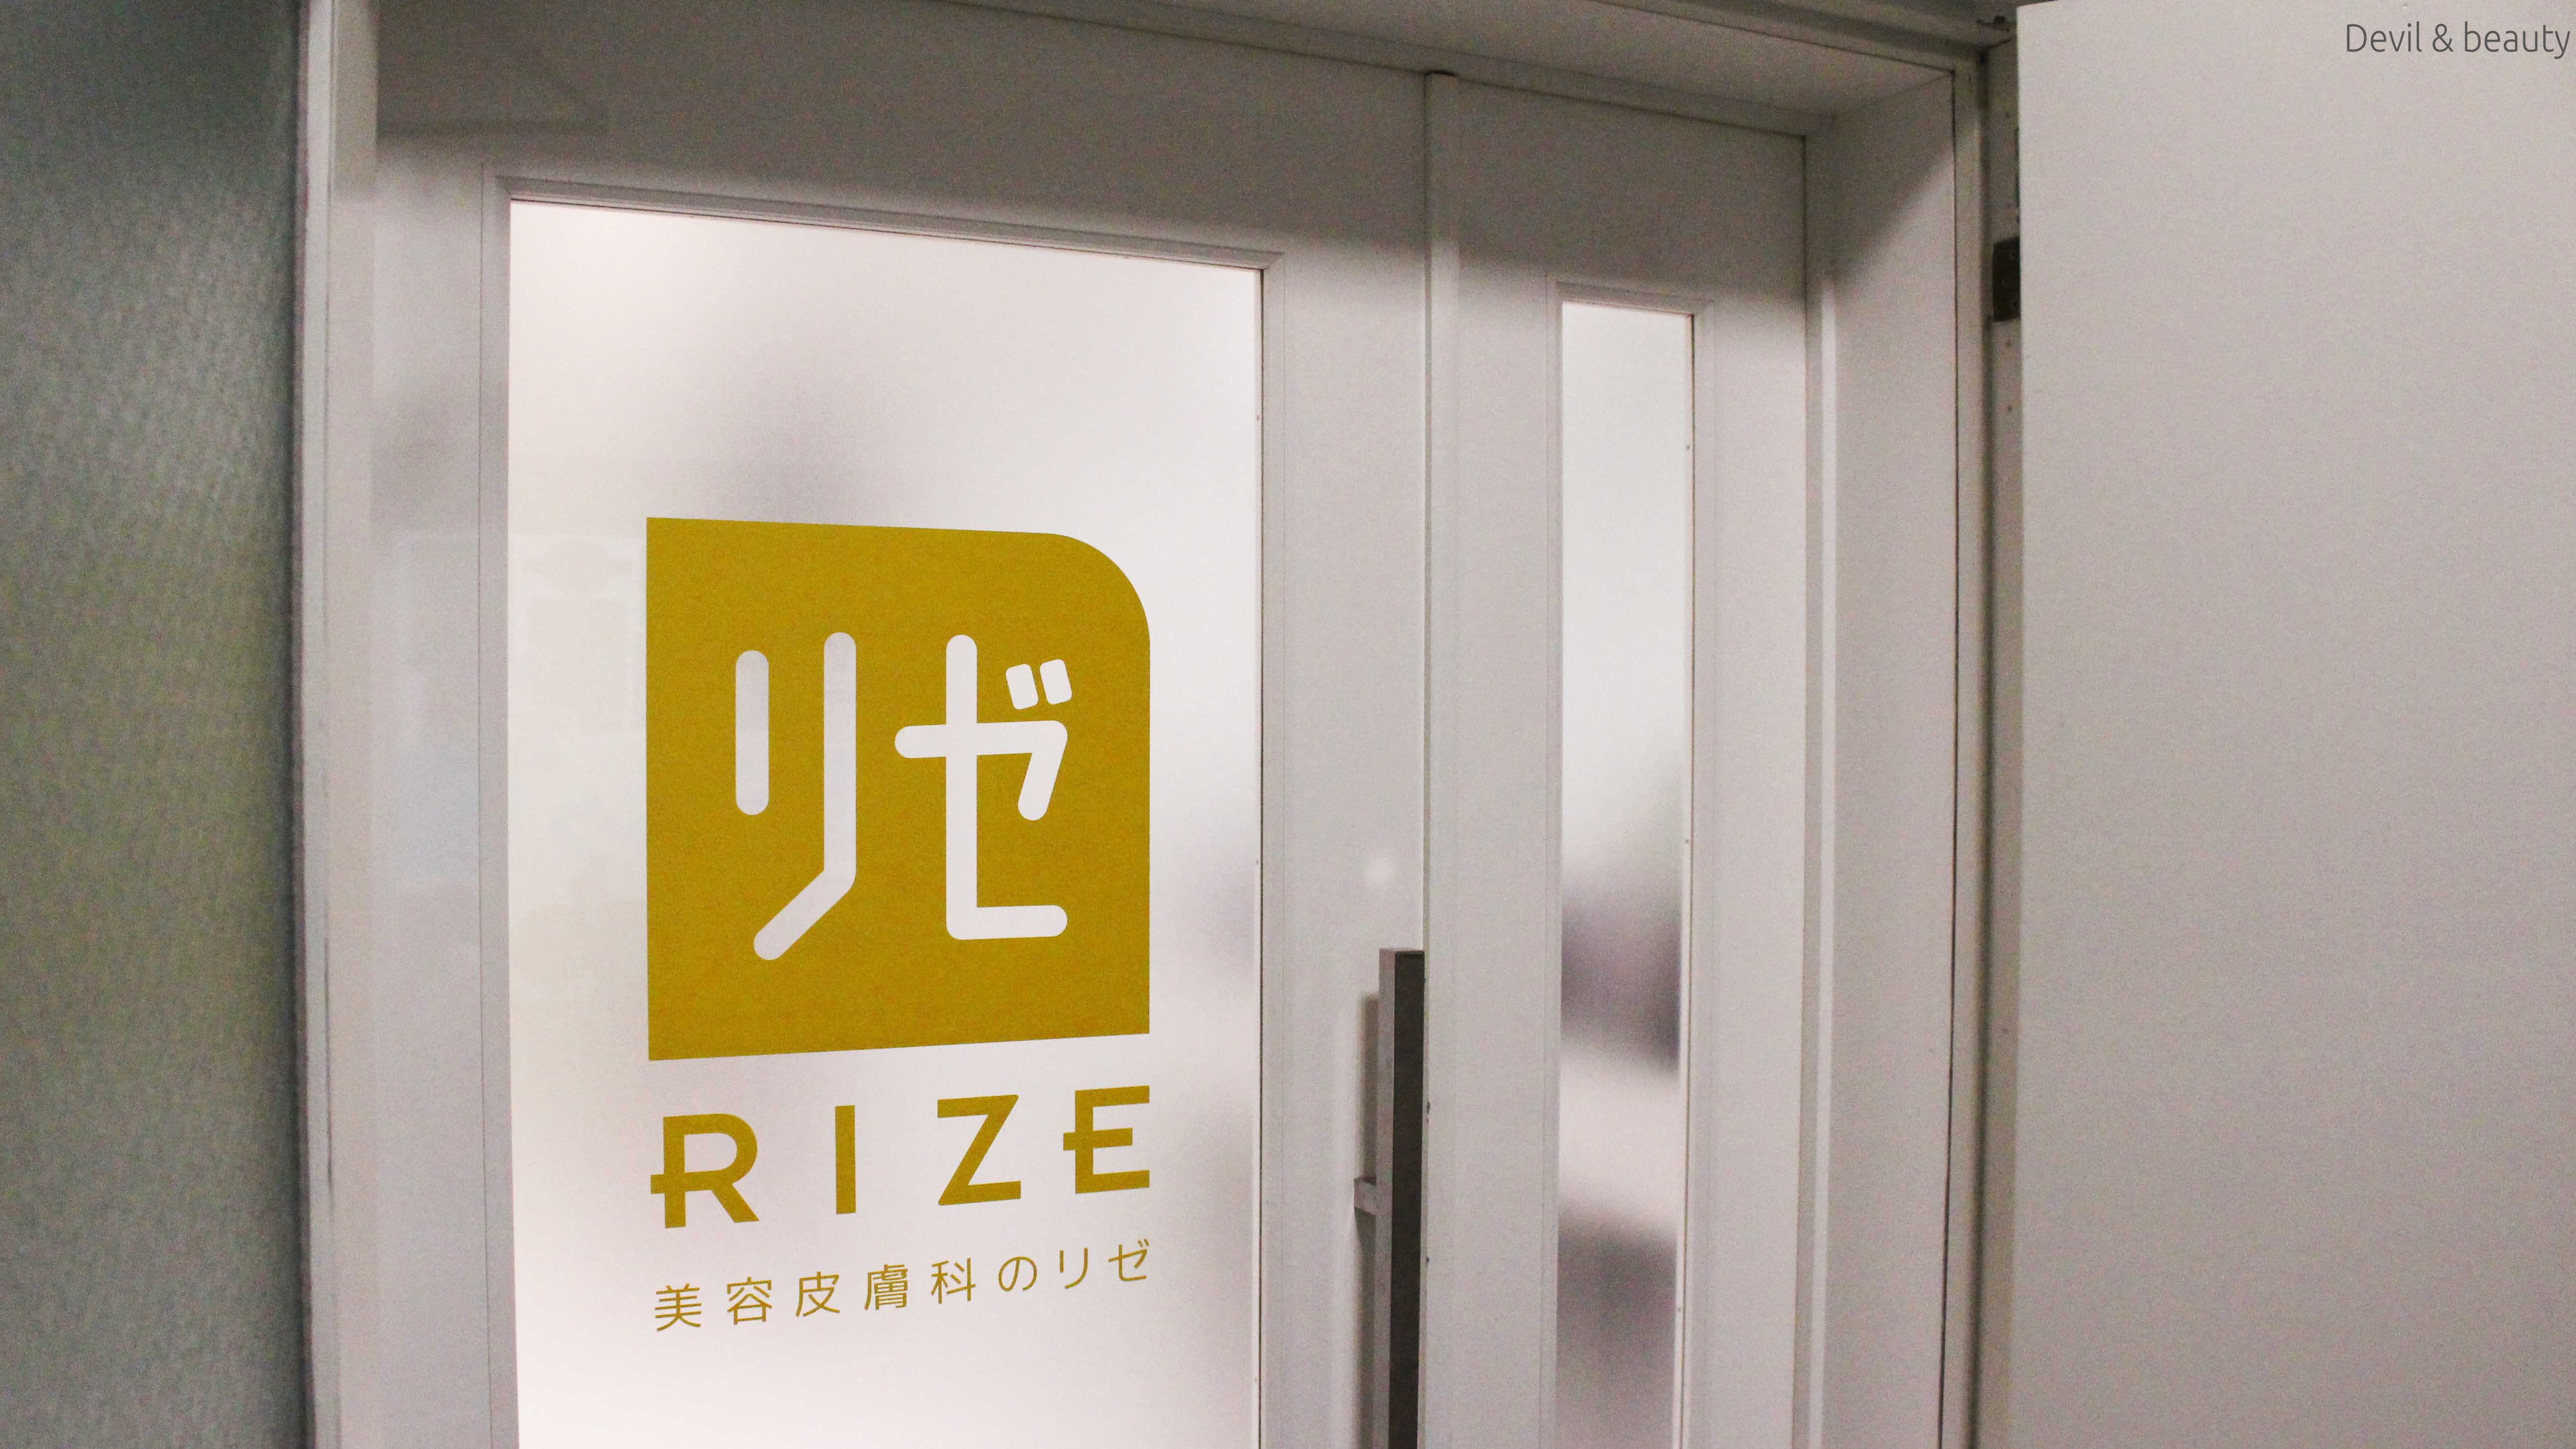 rize-clinic-shinjyuku5 - image